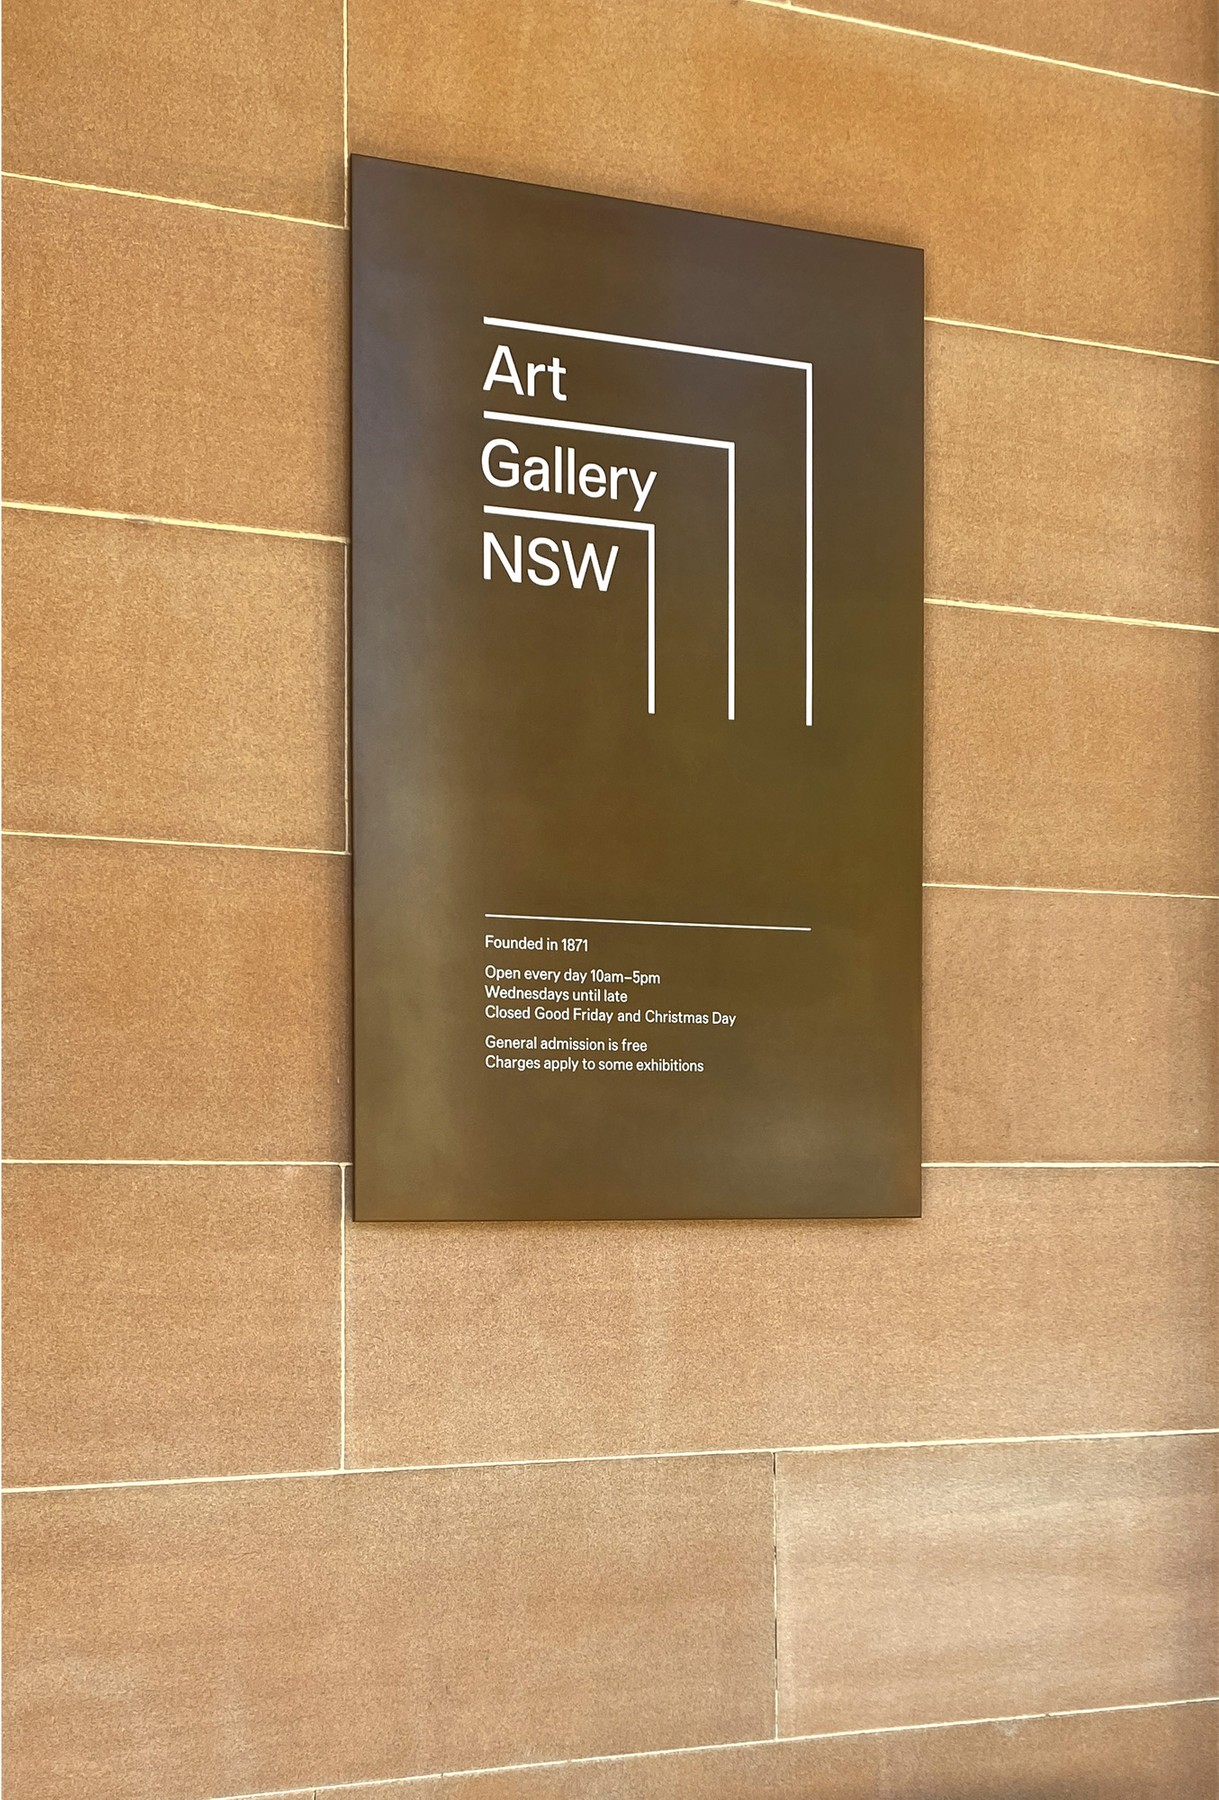 art_gallery_nsw_signage.jpg